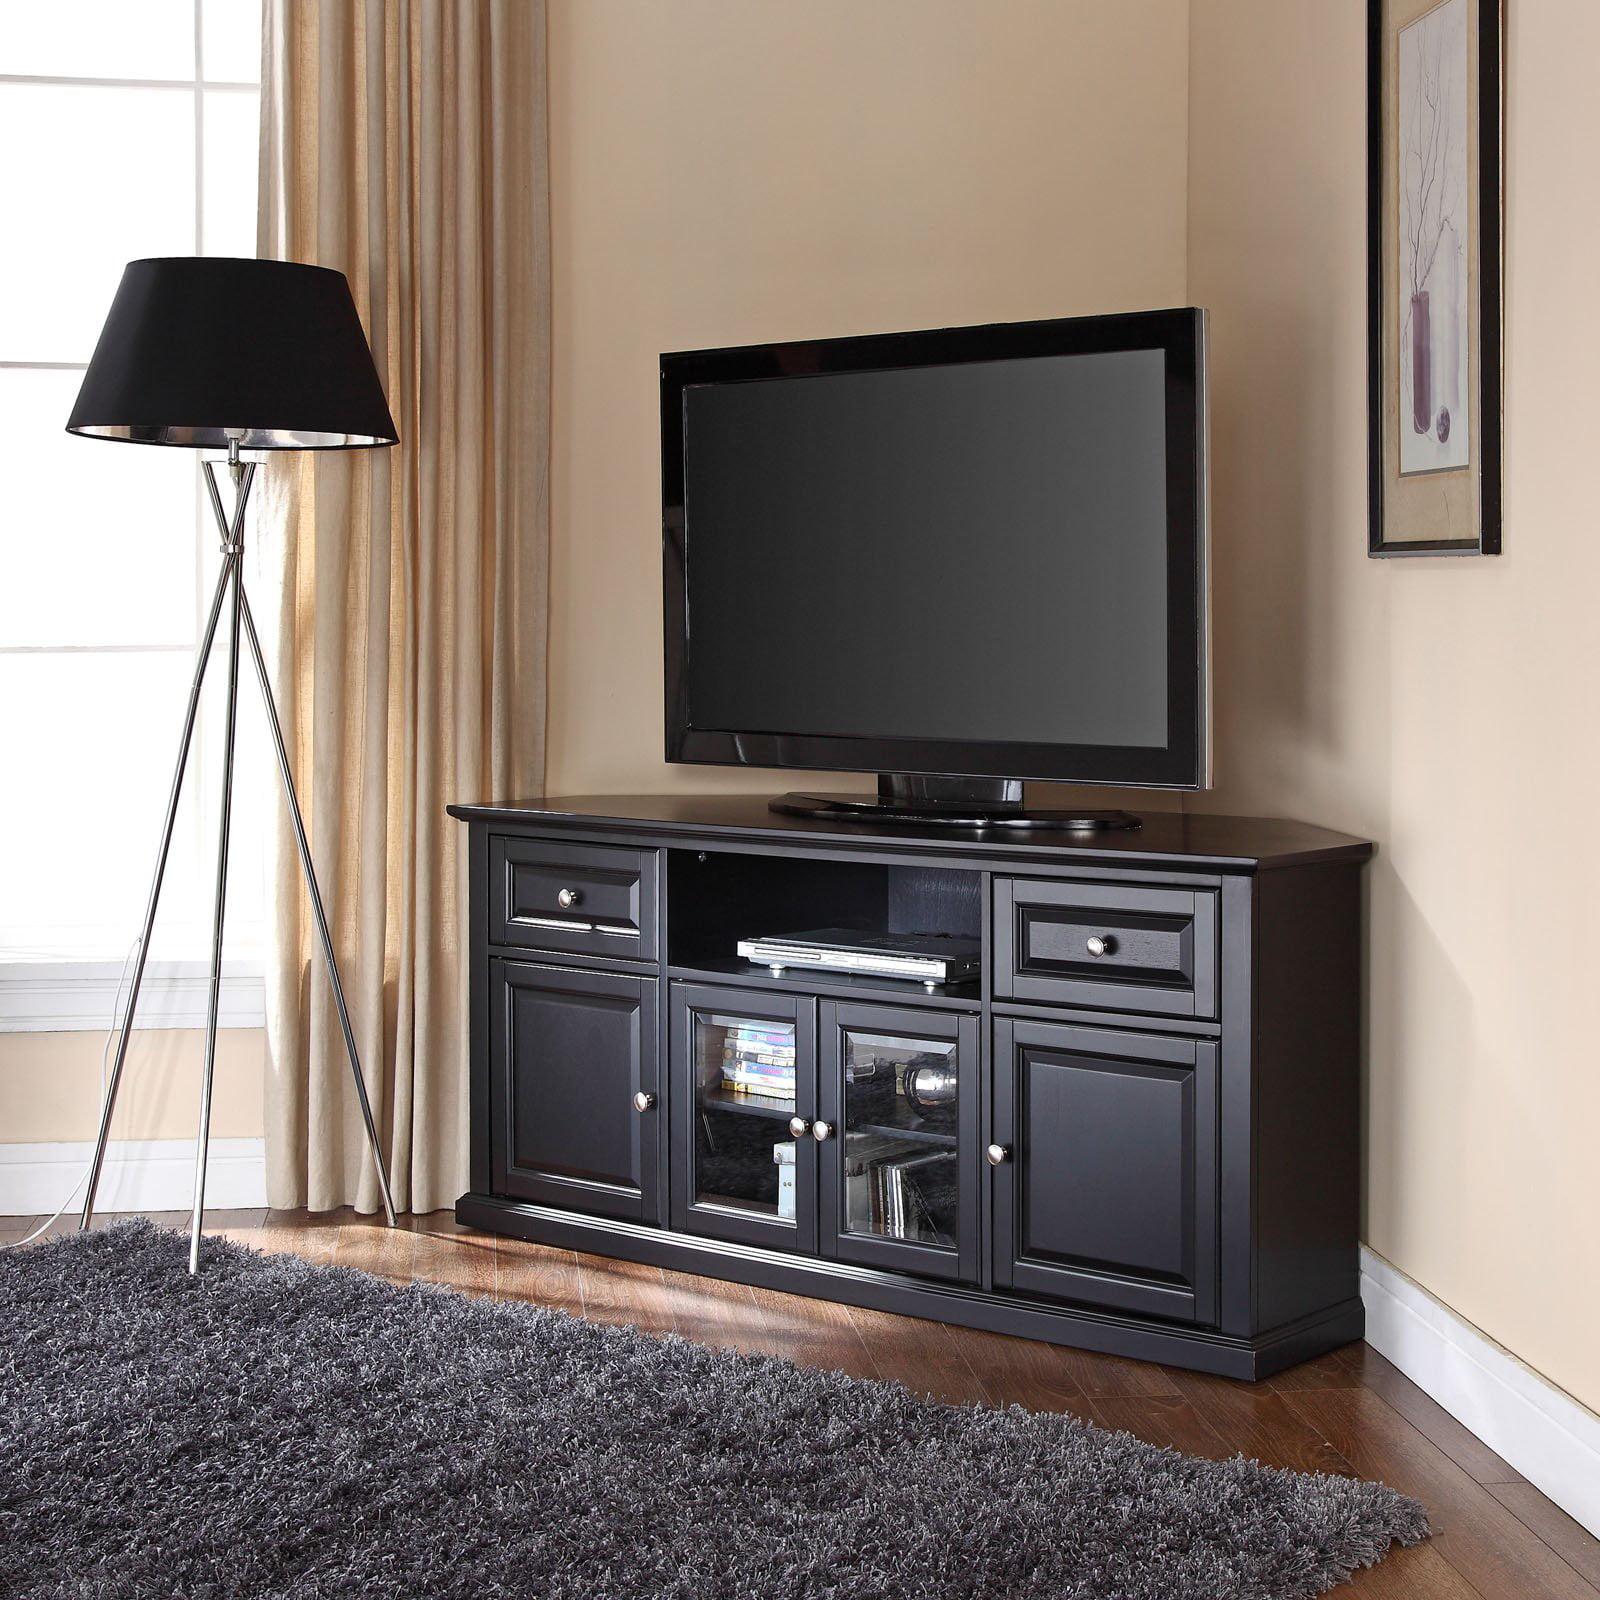 corner tv stand walmart Crosley Furniture Corner TV Stand for TVs up to 60